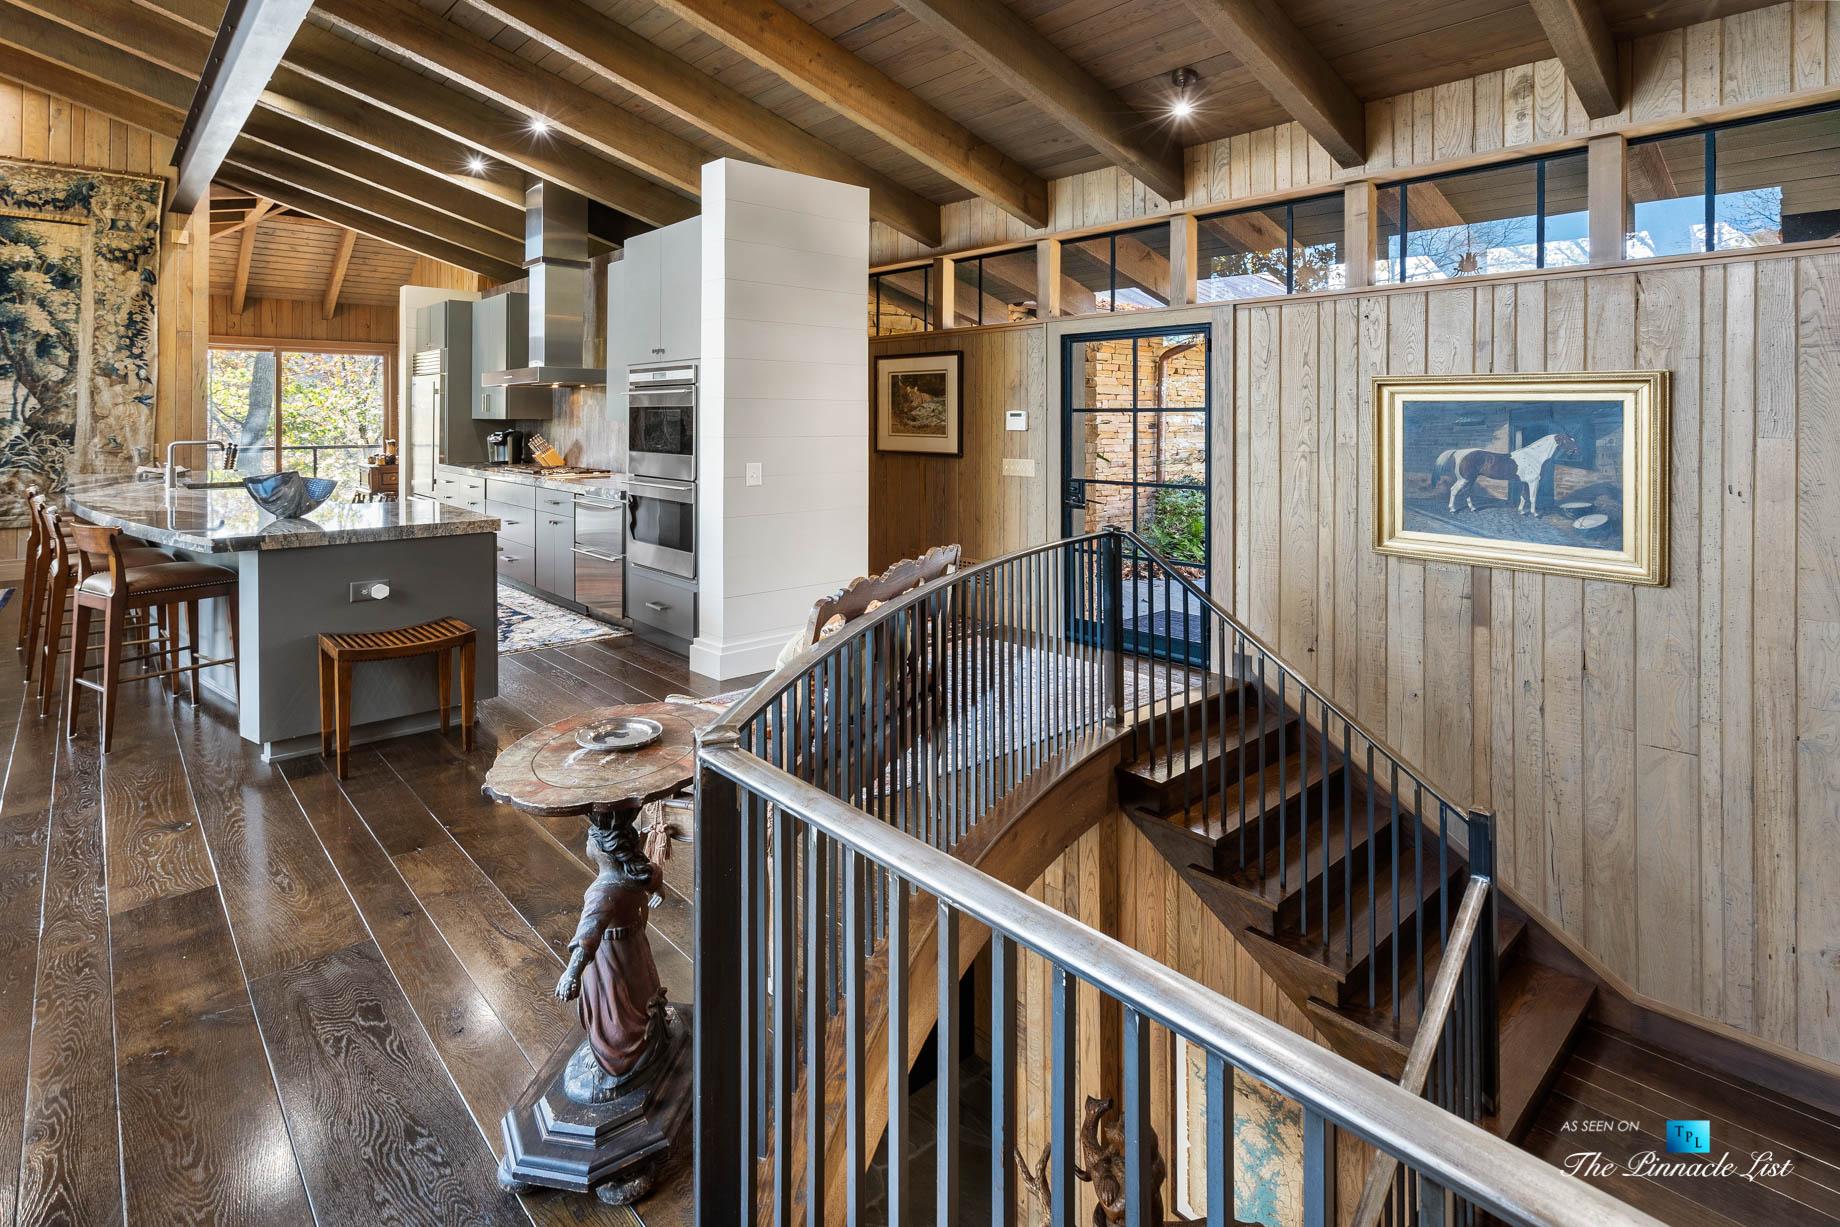 7860 Chestnut Hill Rd, Cumming, GA, USA - Stairs - Luxury Real Estate - Lake Lanier Mid-Century Modern Stone Home